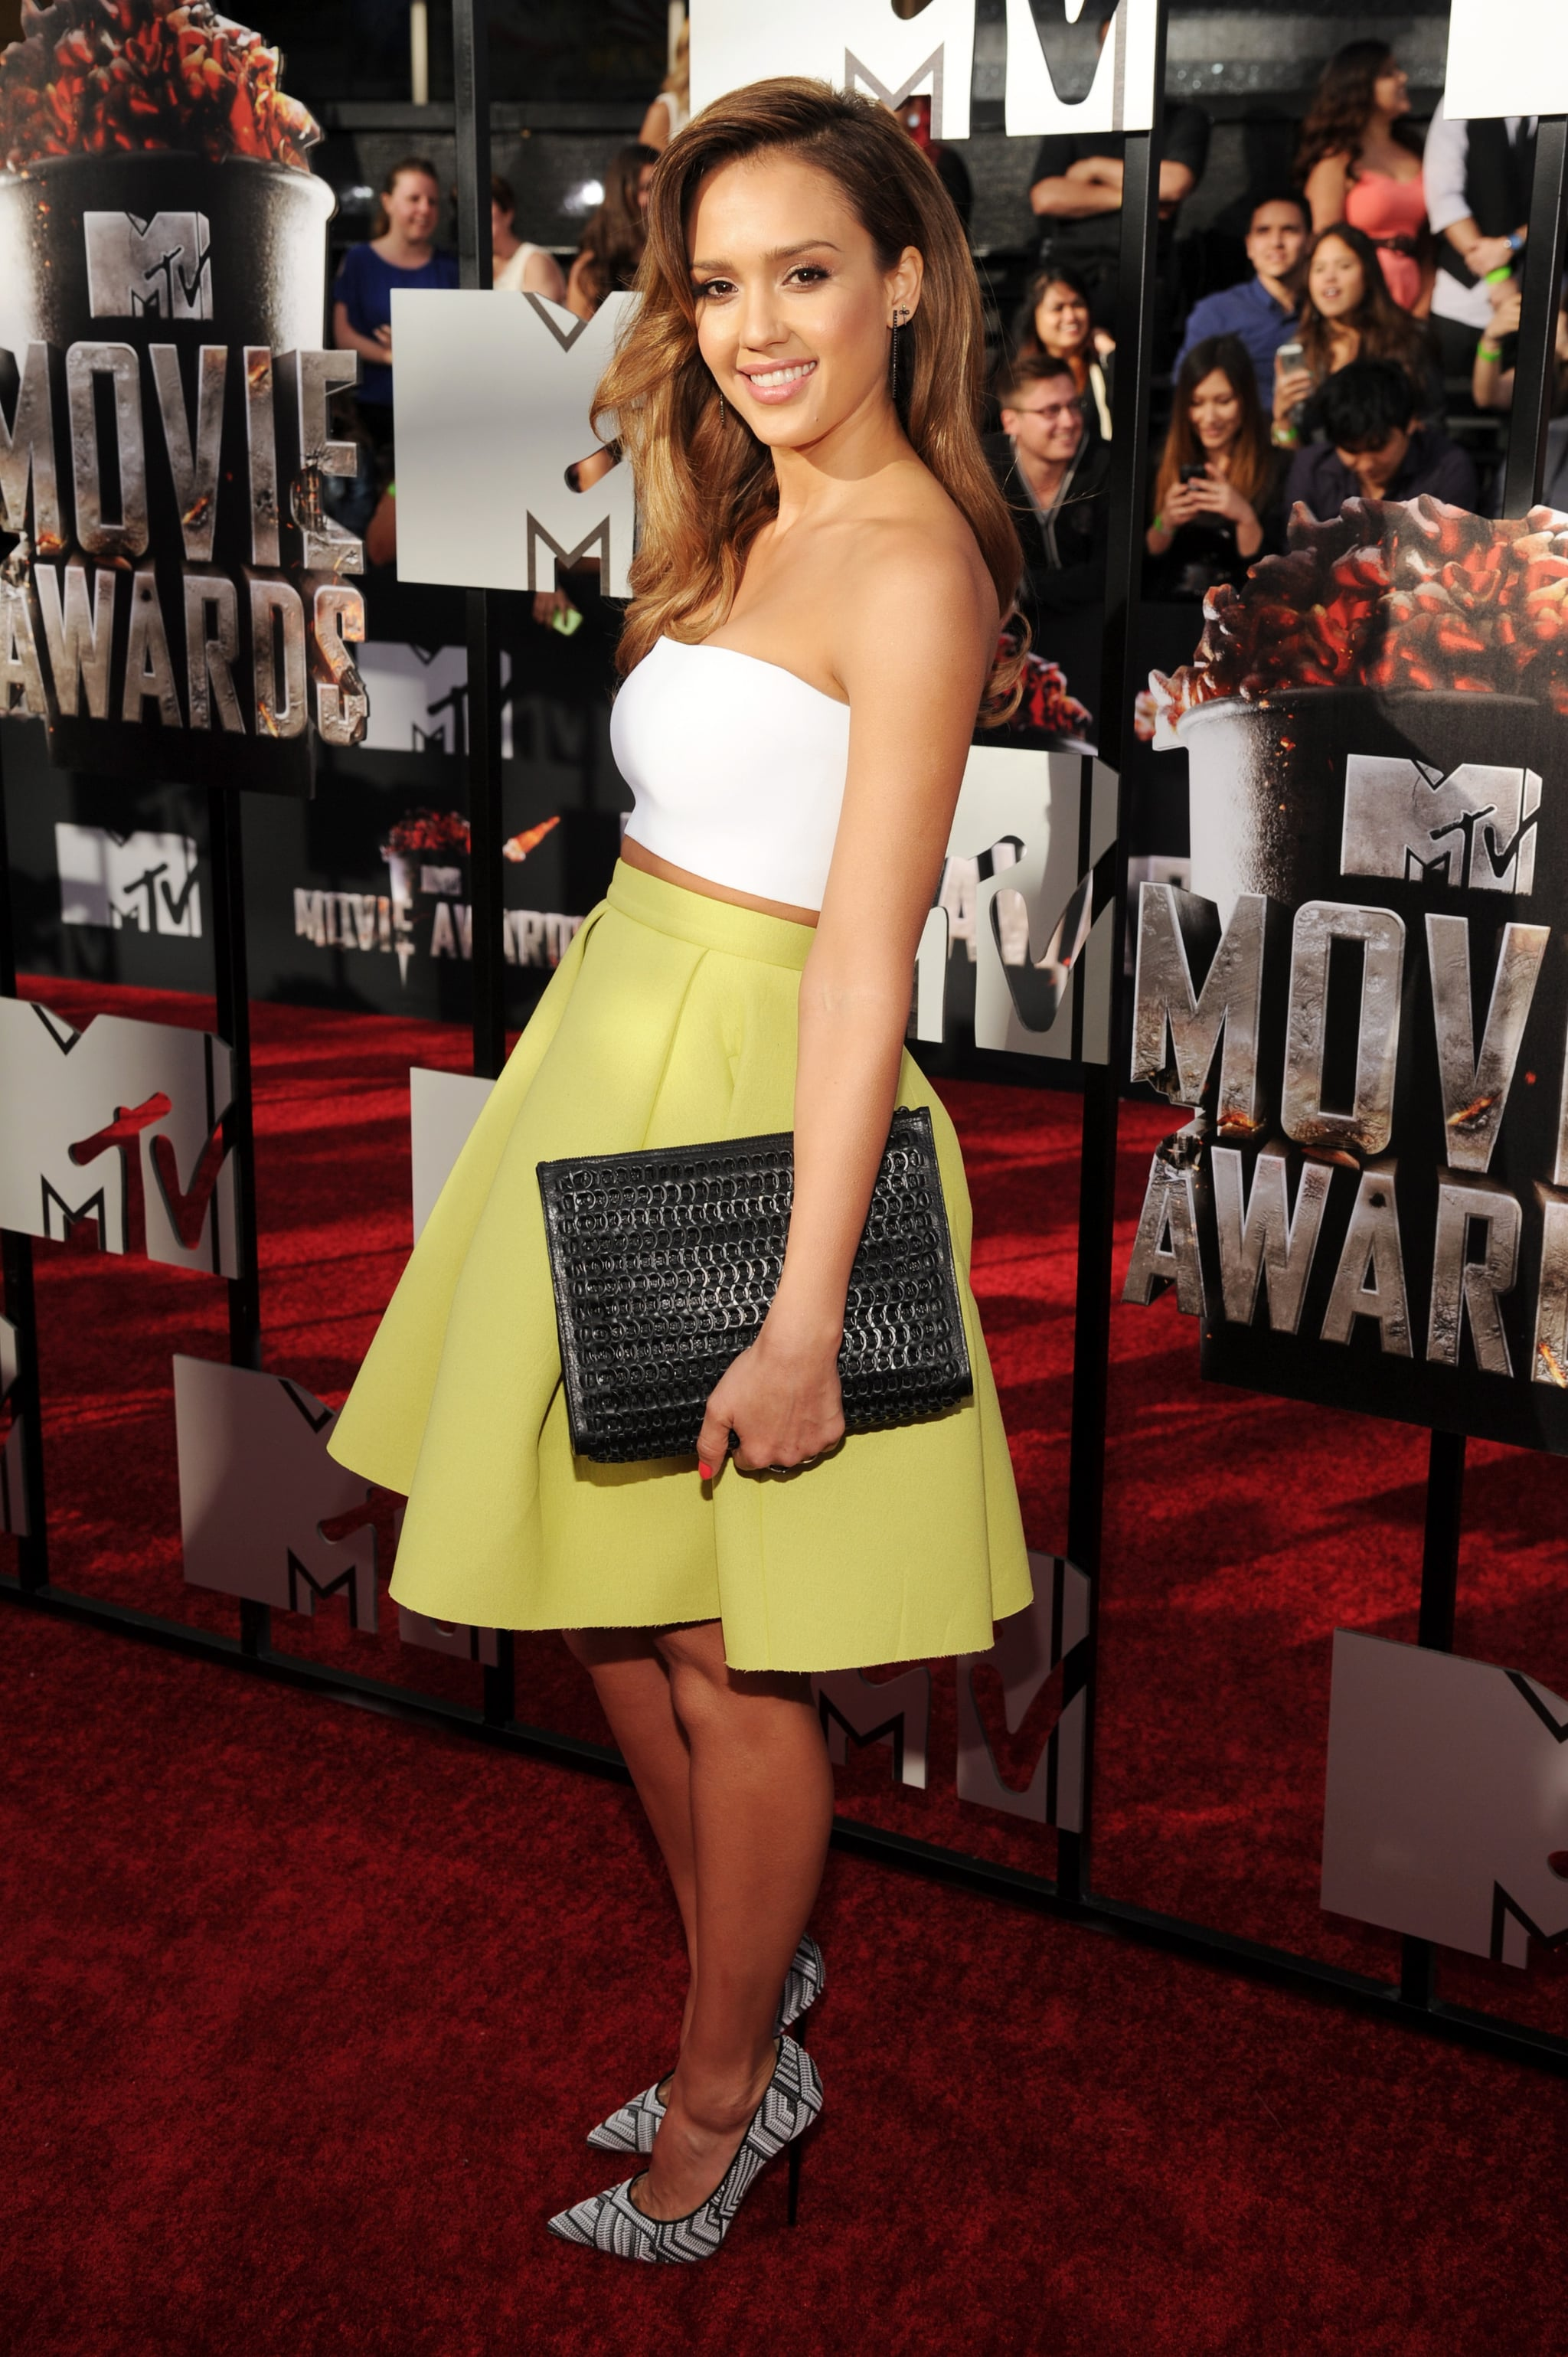 Jessica Alba Lights Up the MTV Movie Awards